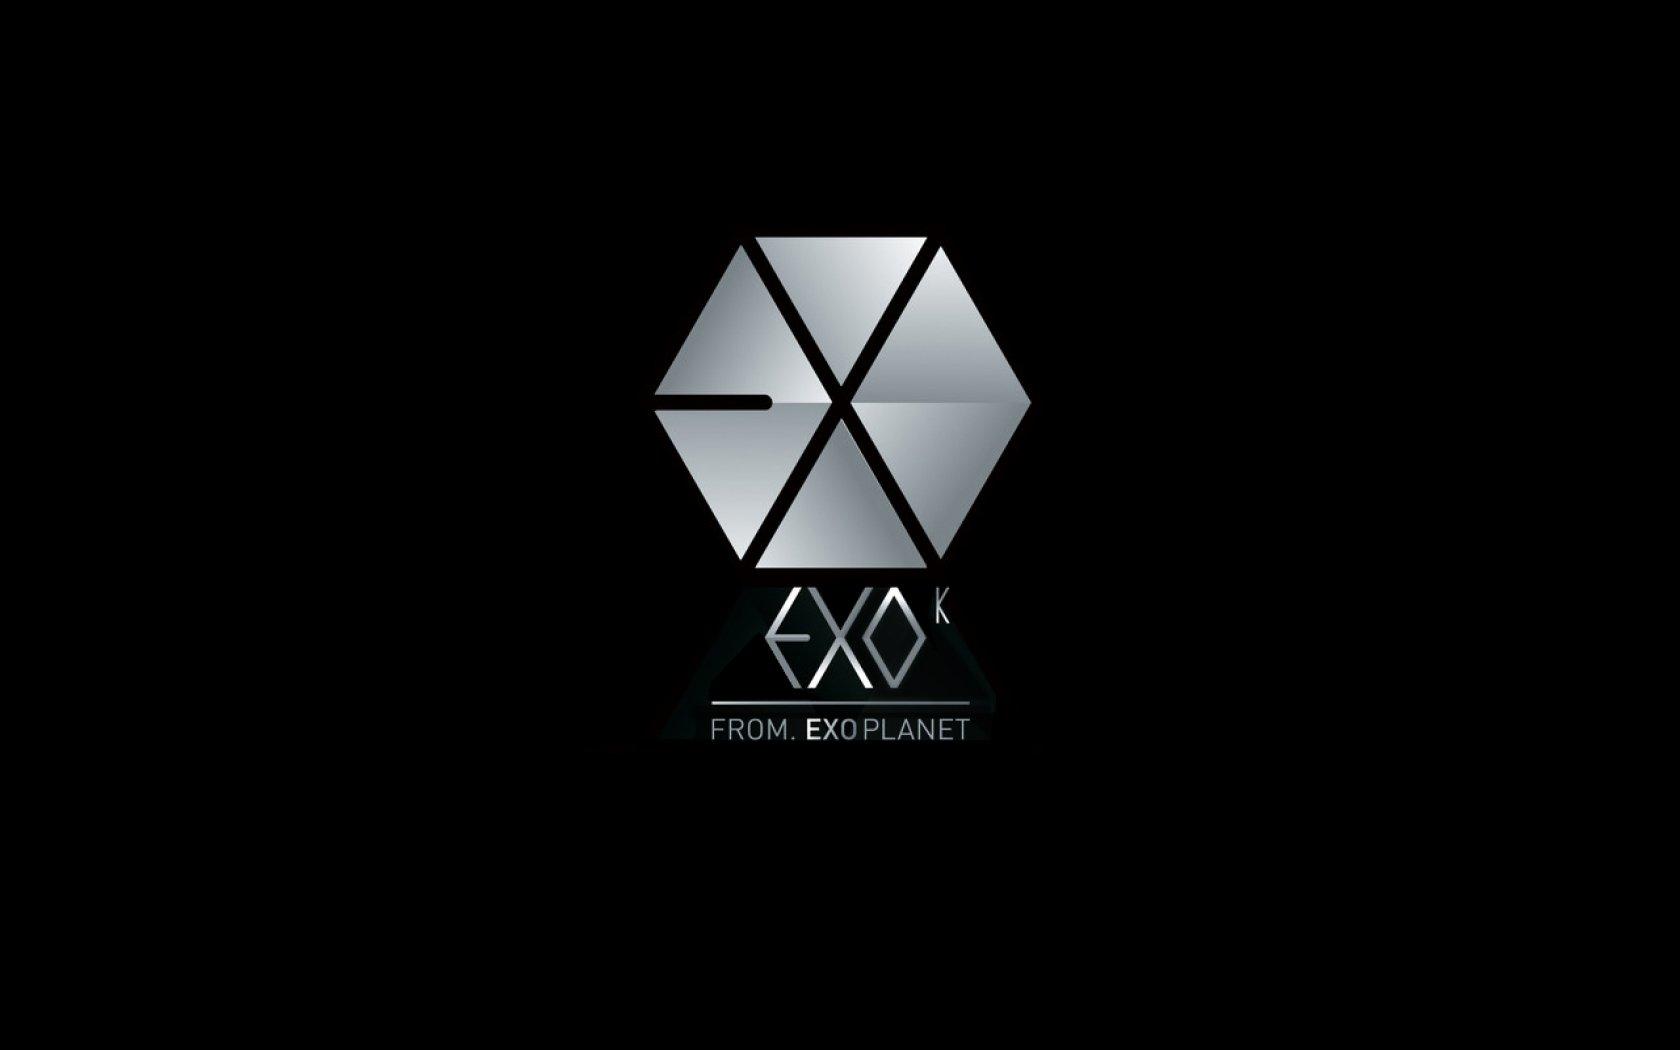 EXO   EXO K Wallpaper 32537980 1680x1050